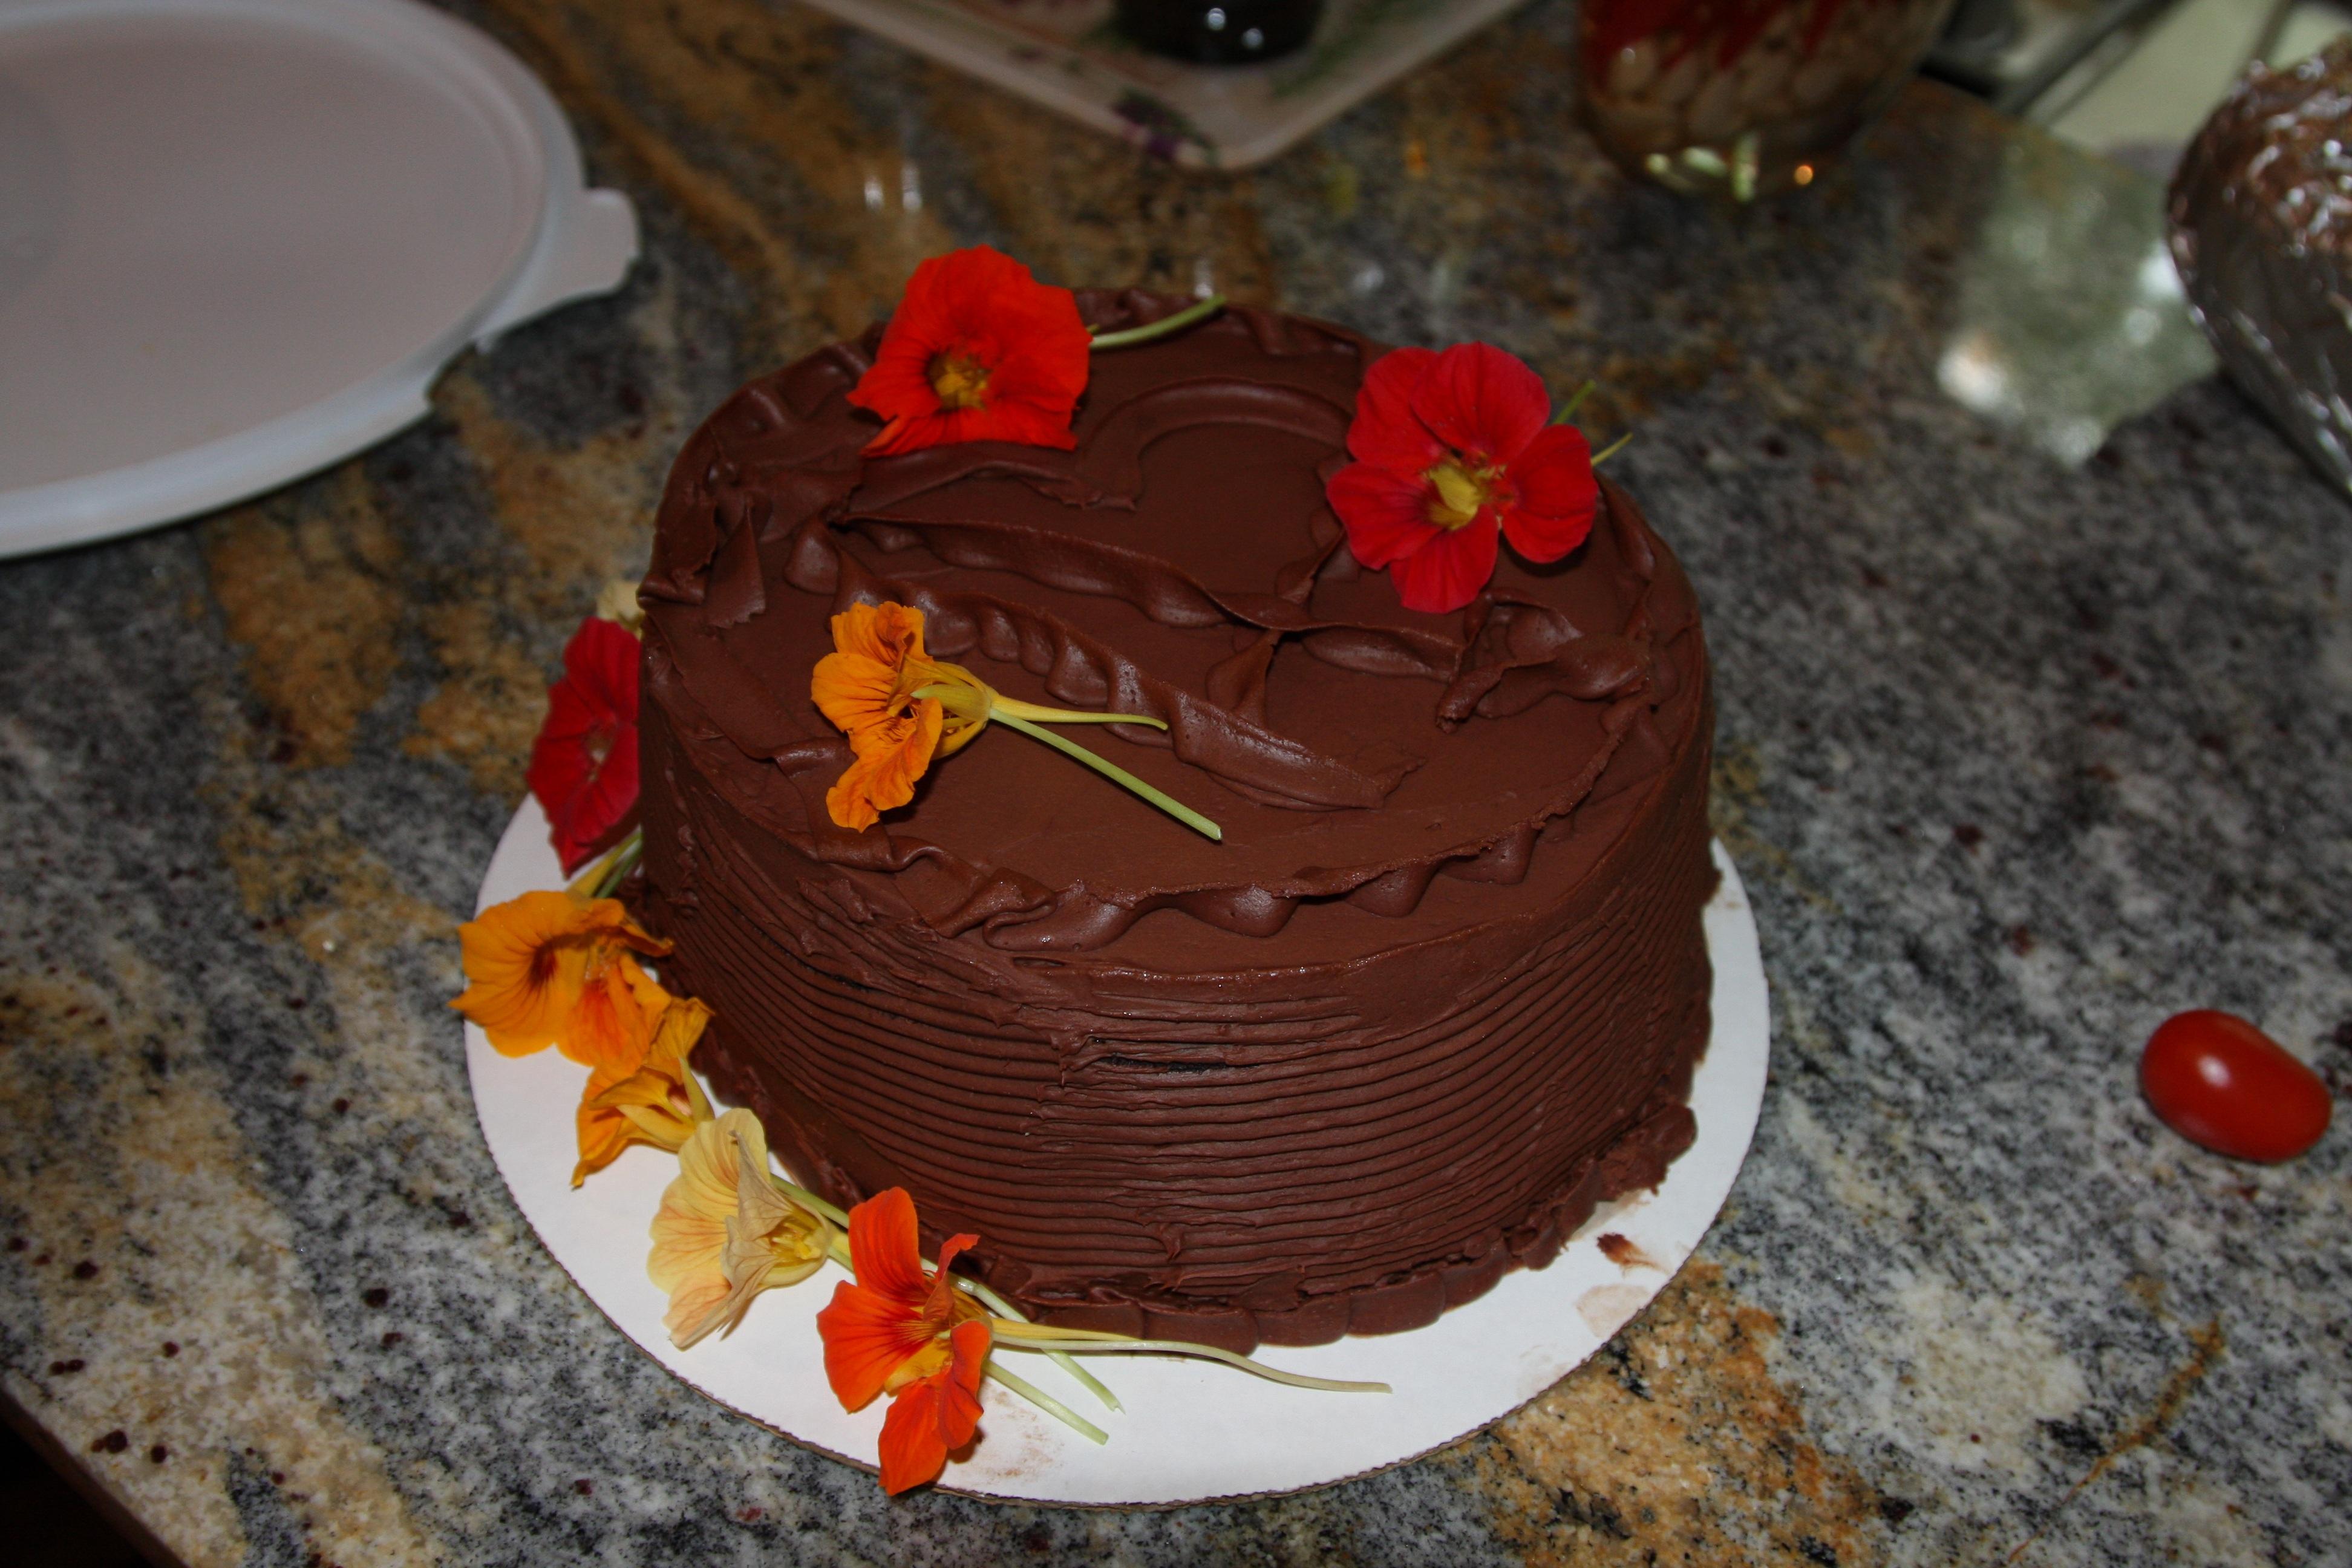 Gateau boulangerie chocolat